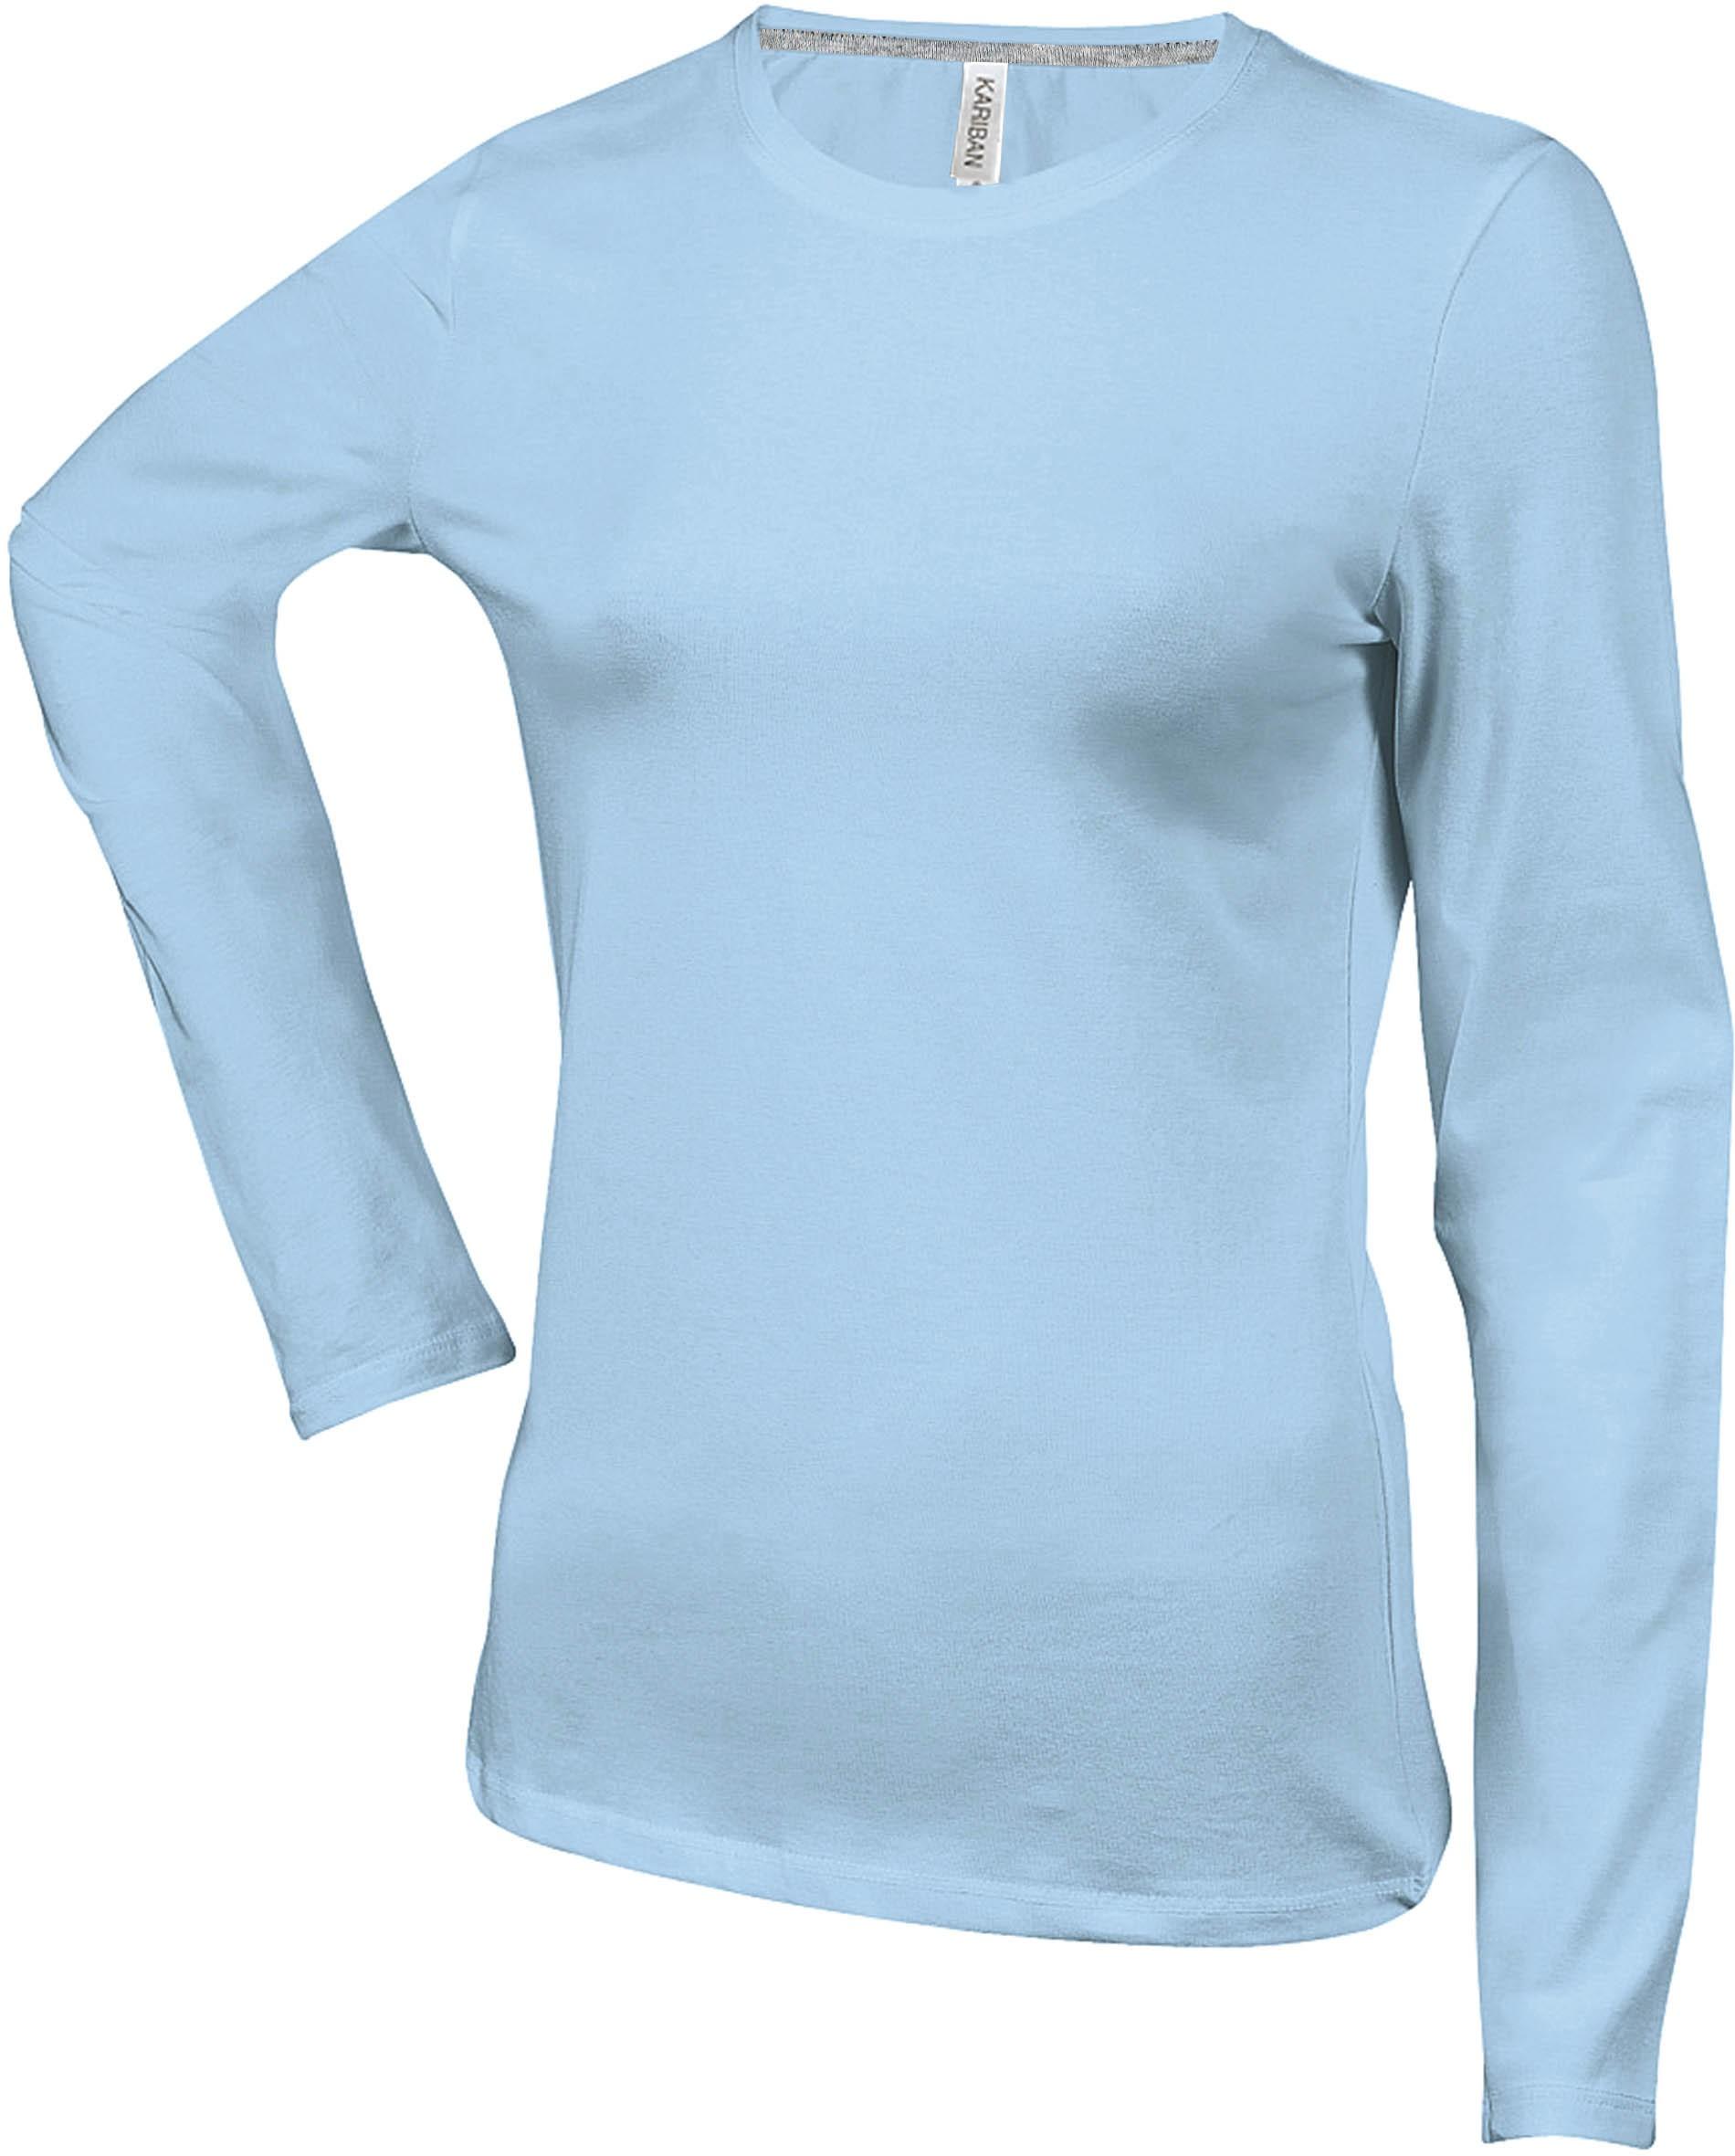 285c10dfd08fb Tee shirt uni en coton - Manches longues - Femme - Bleu Ciel -K383